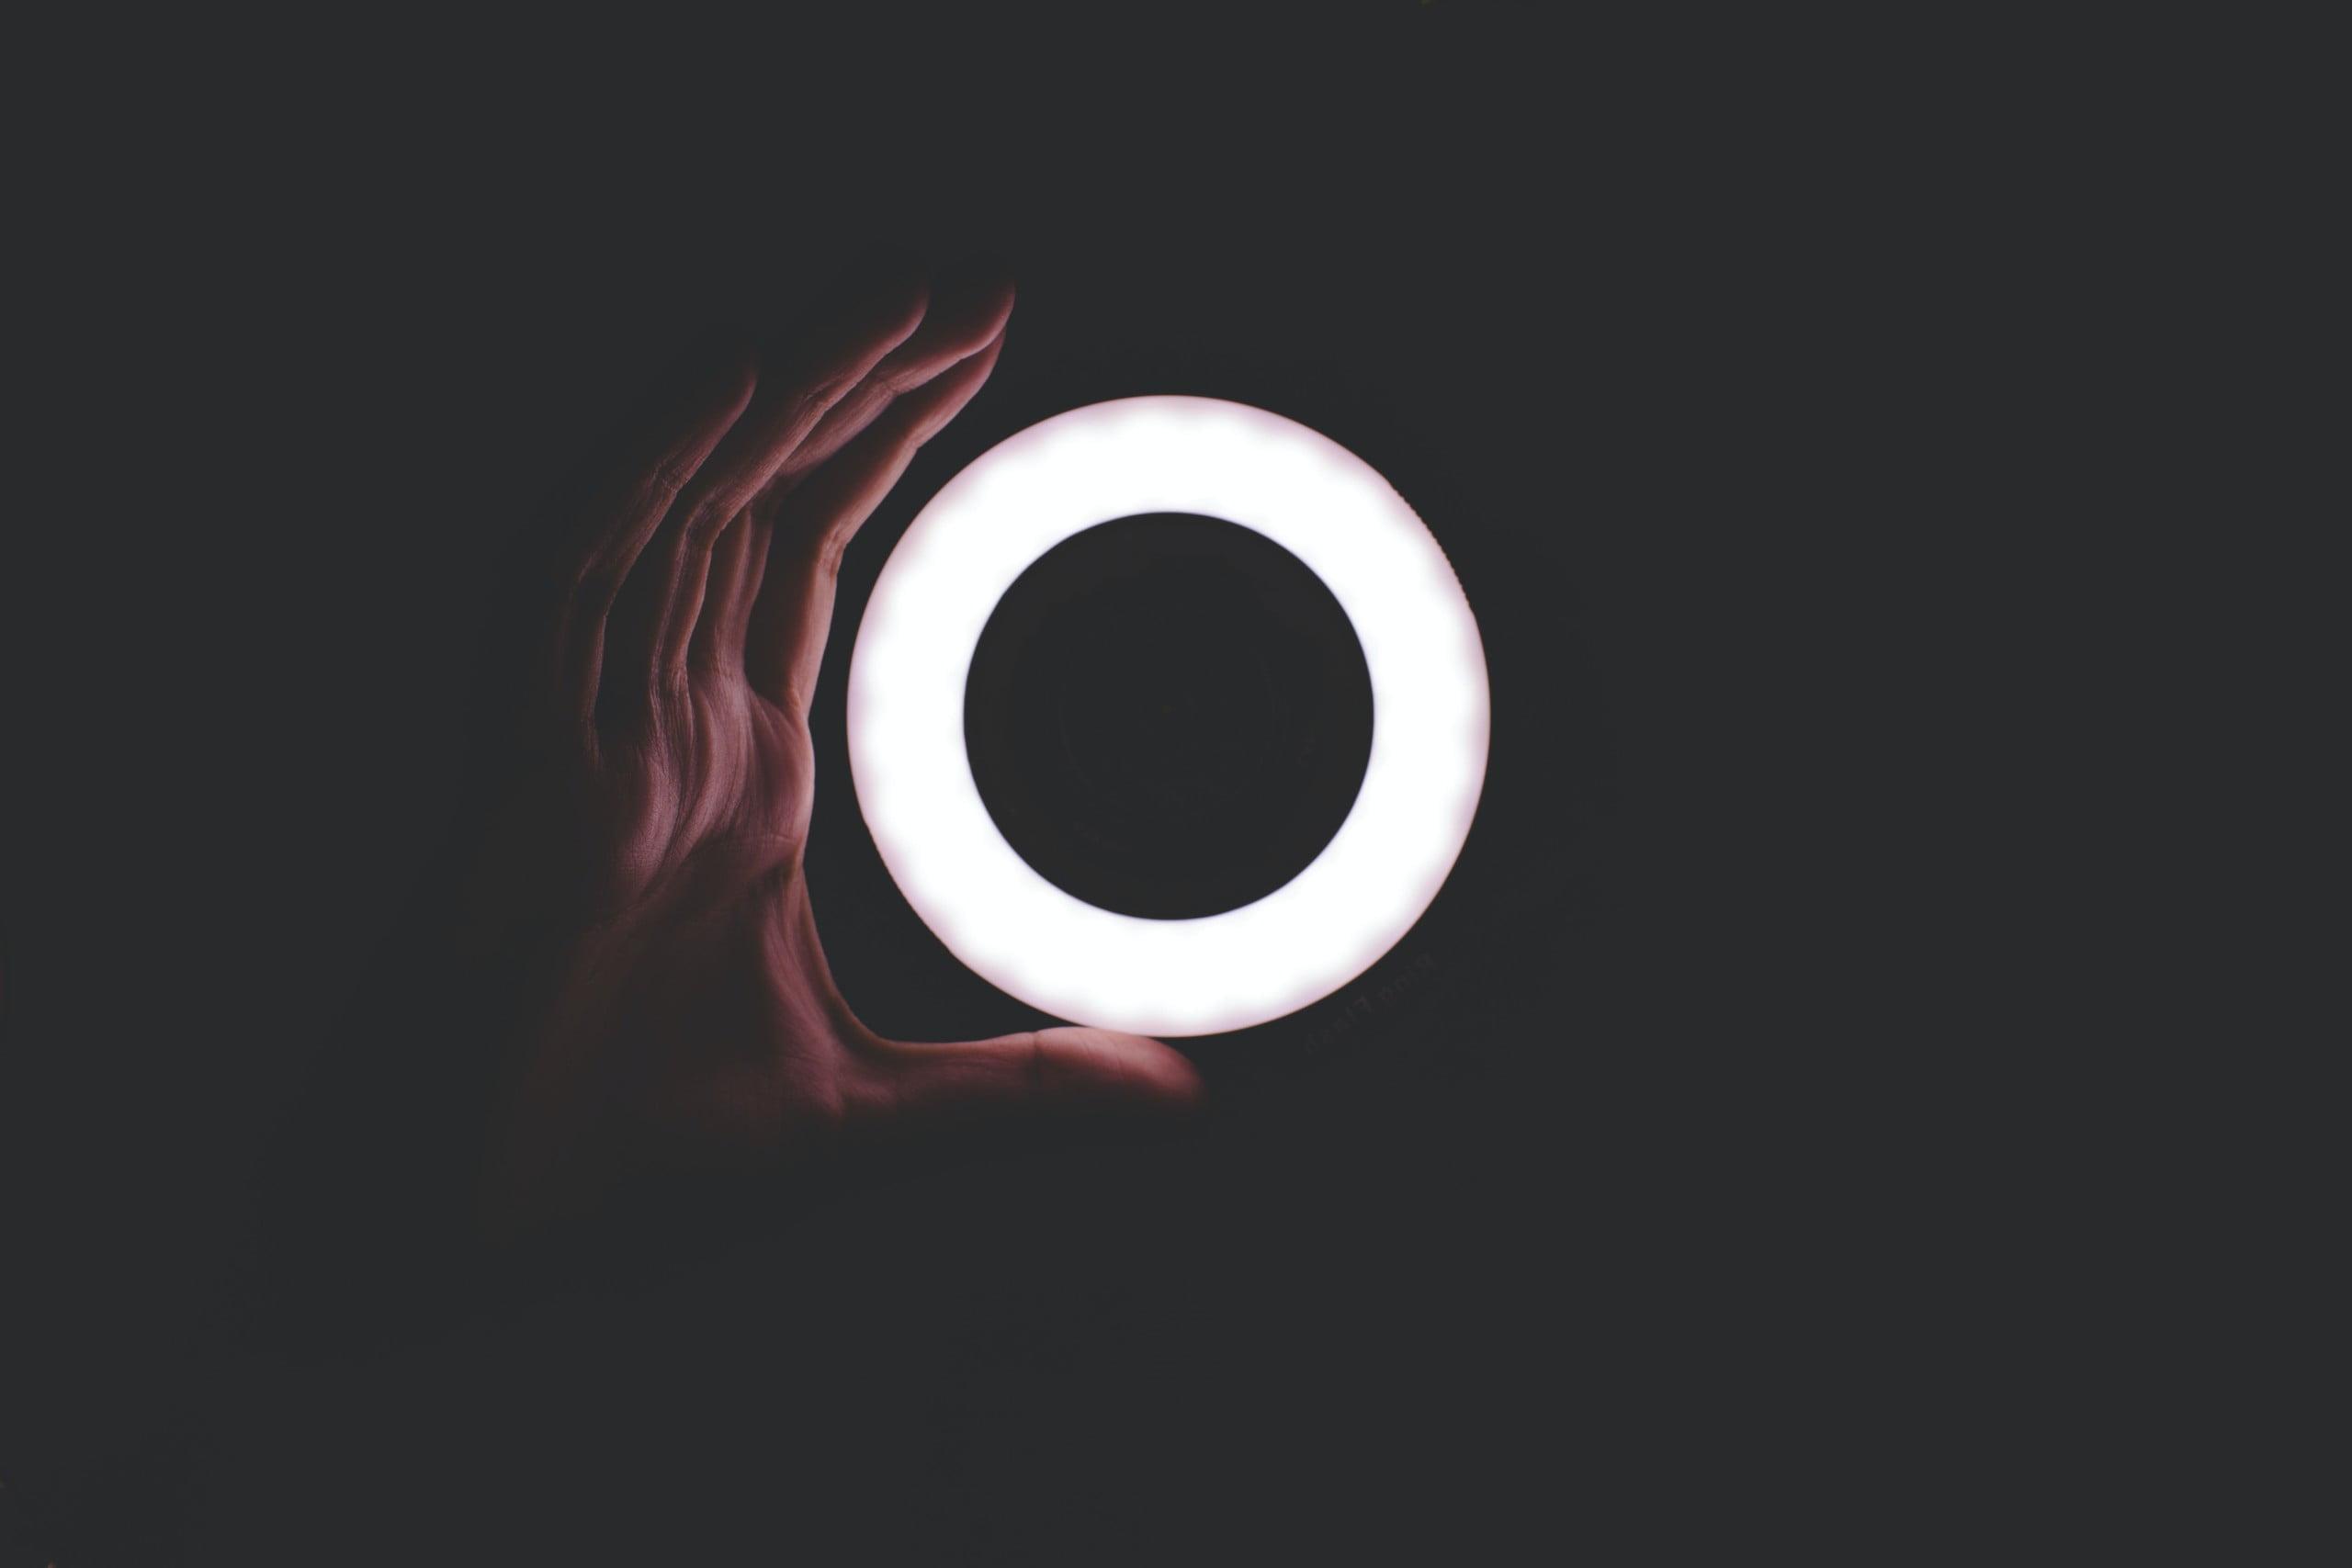 Hand curved like circle light